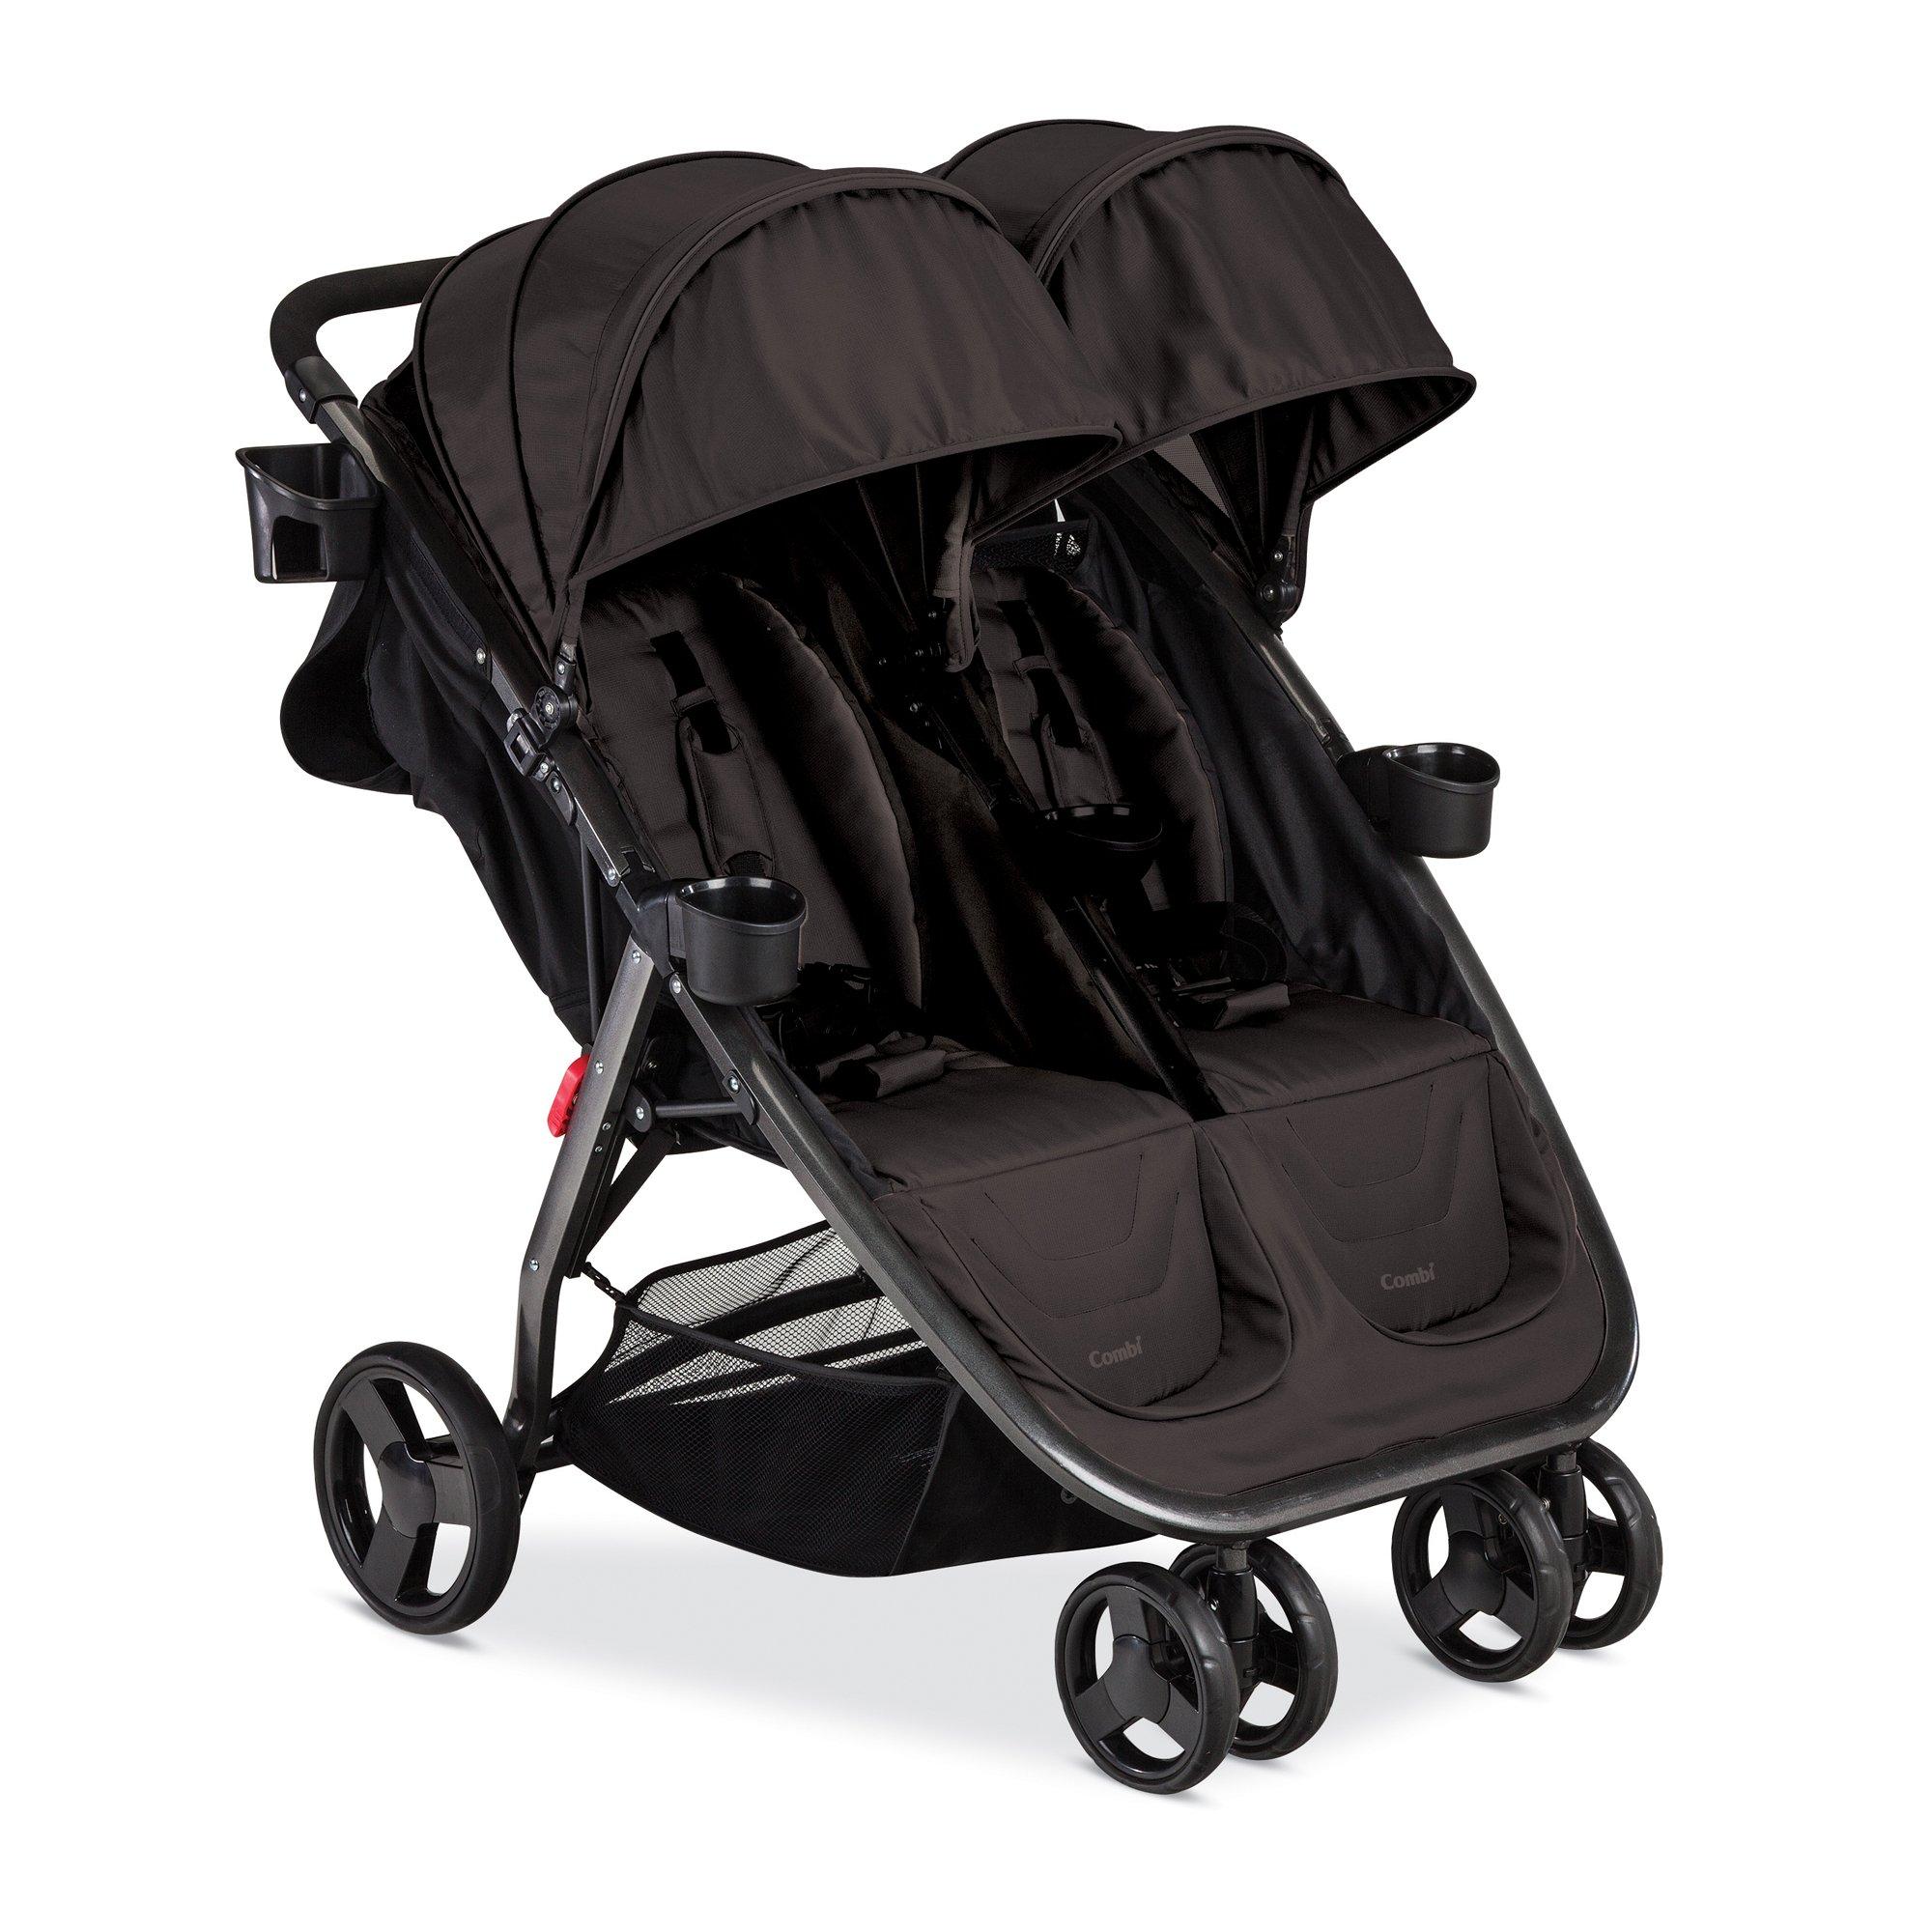 Combi Fold N Go Double Stroller, Black by Combi